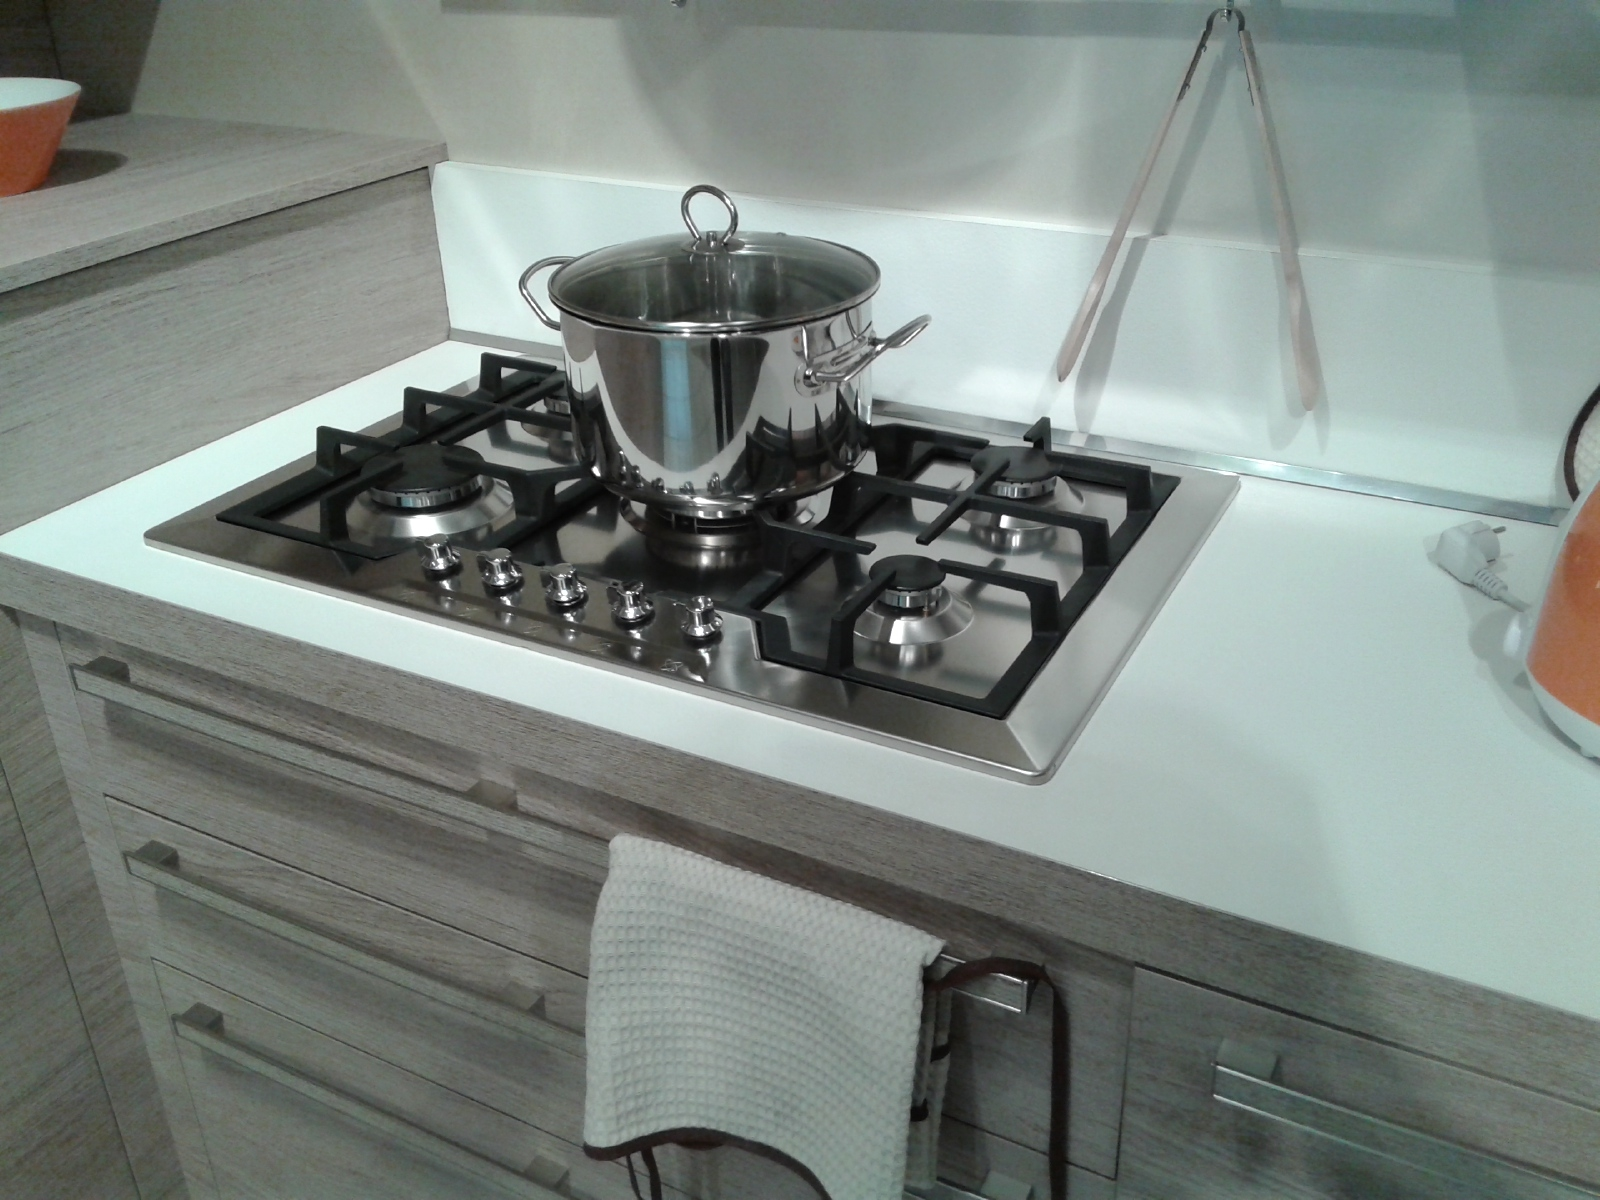 Cucina Veneta Cucine Ethica Decorativo Laminato Materico Cucine A  #6E4837 1600 1200 Rivenditori Veneta Cucine Rovigo